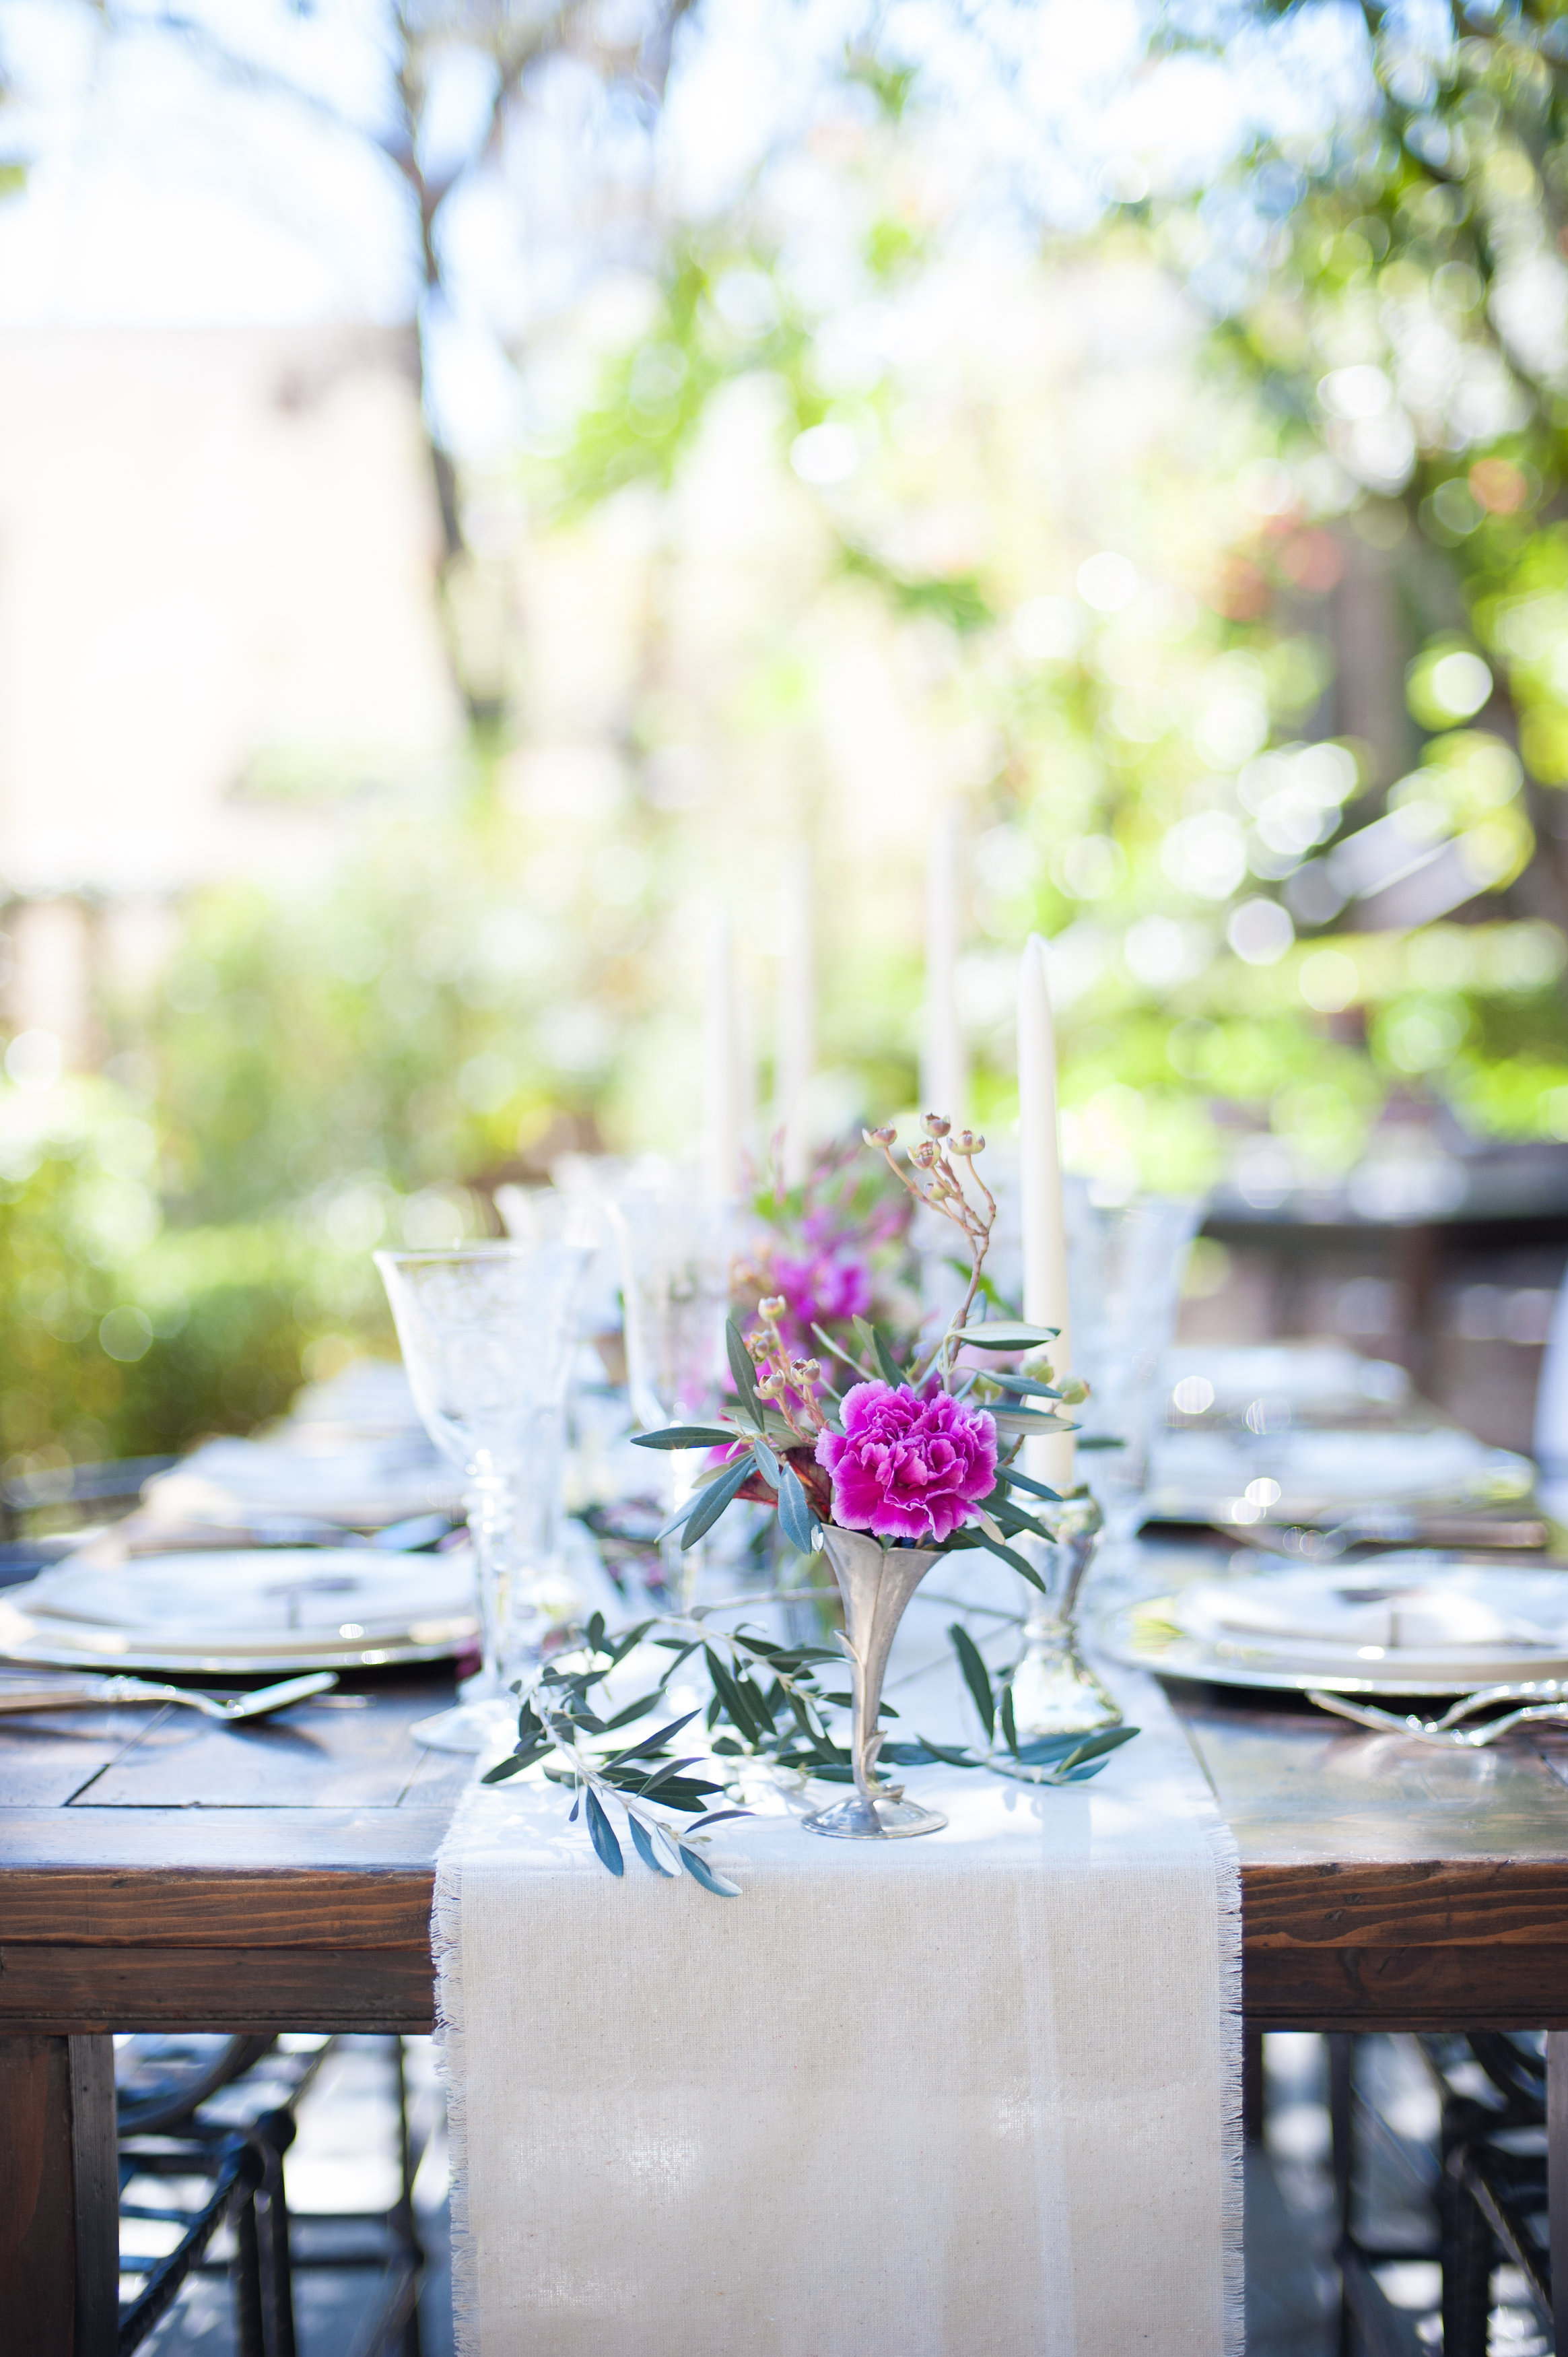 green-vase-emerald-flowers-wedding.jpg